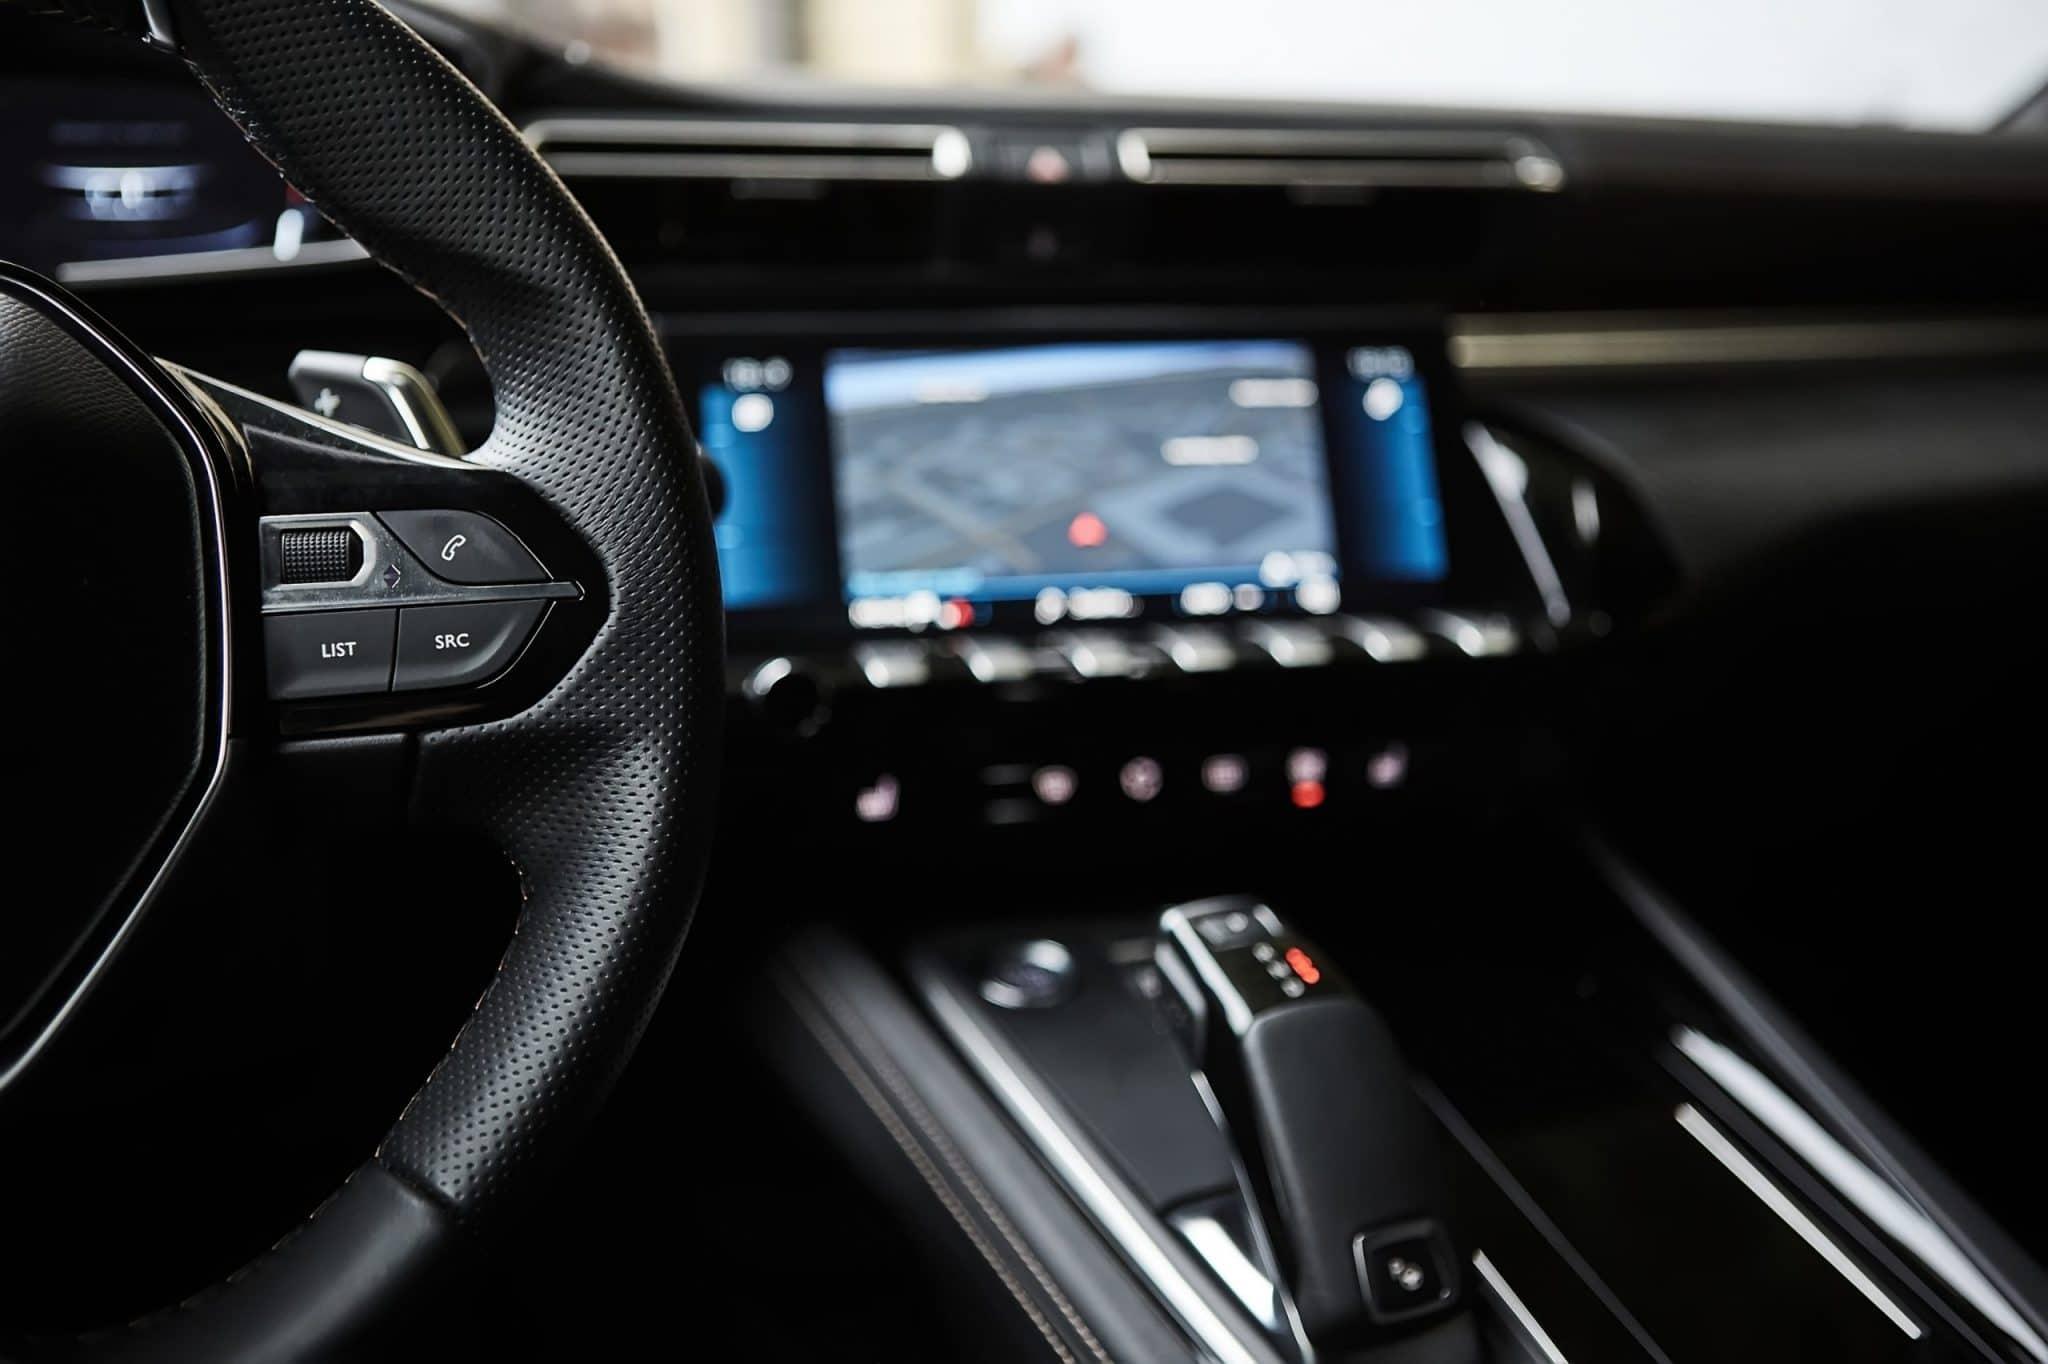 Range Rover interior | Range Rover transmission specialists Alloa, Stirling, Falkirk